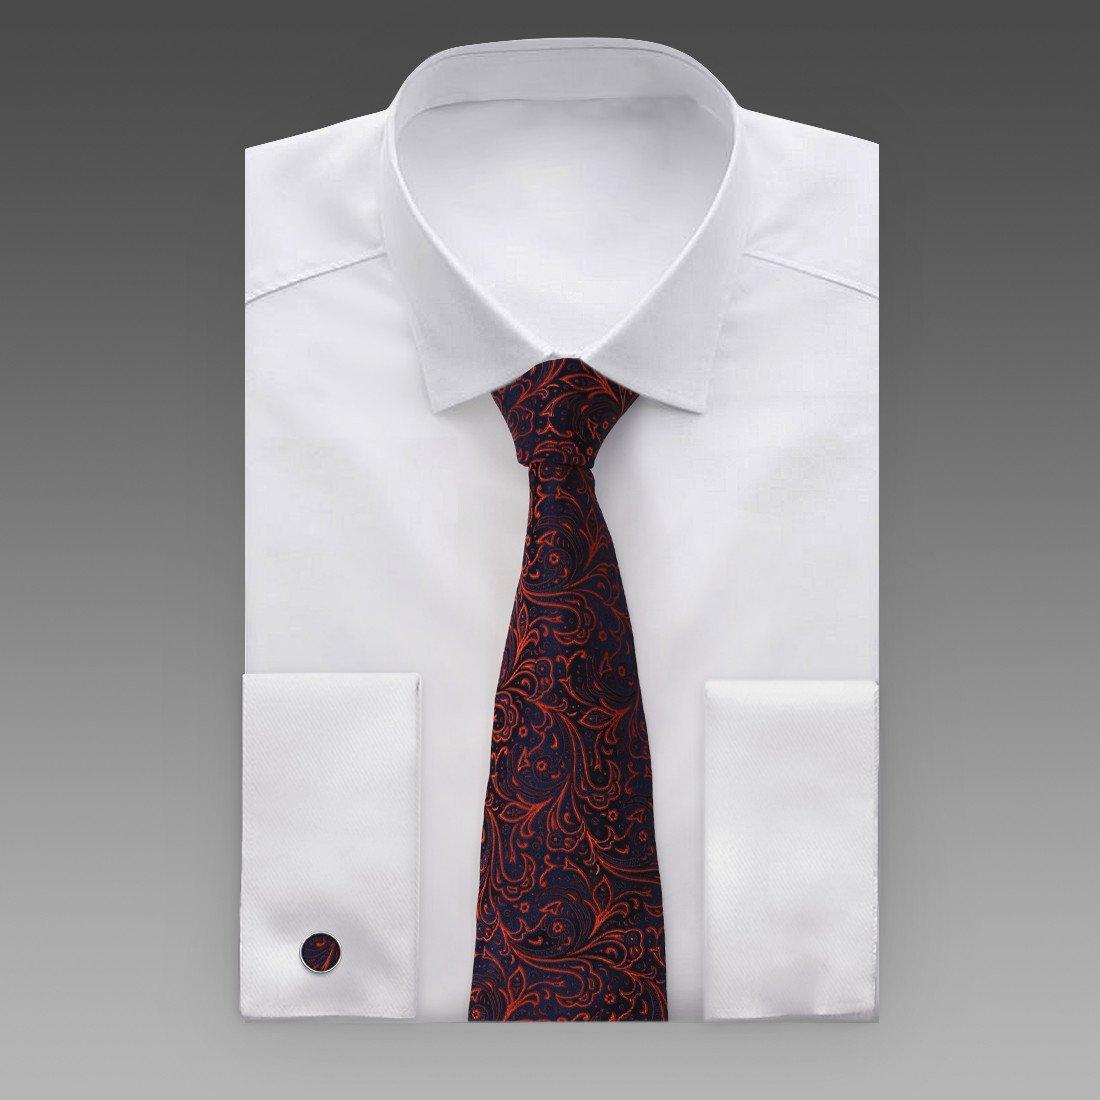 Y/&G Mens Fashion Luxury Gift Multi-colored Paisleys Silk Tie Cufflinks Hanky Set 3PT for Mens